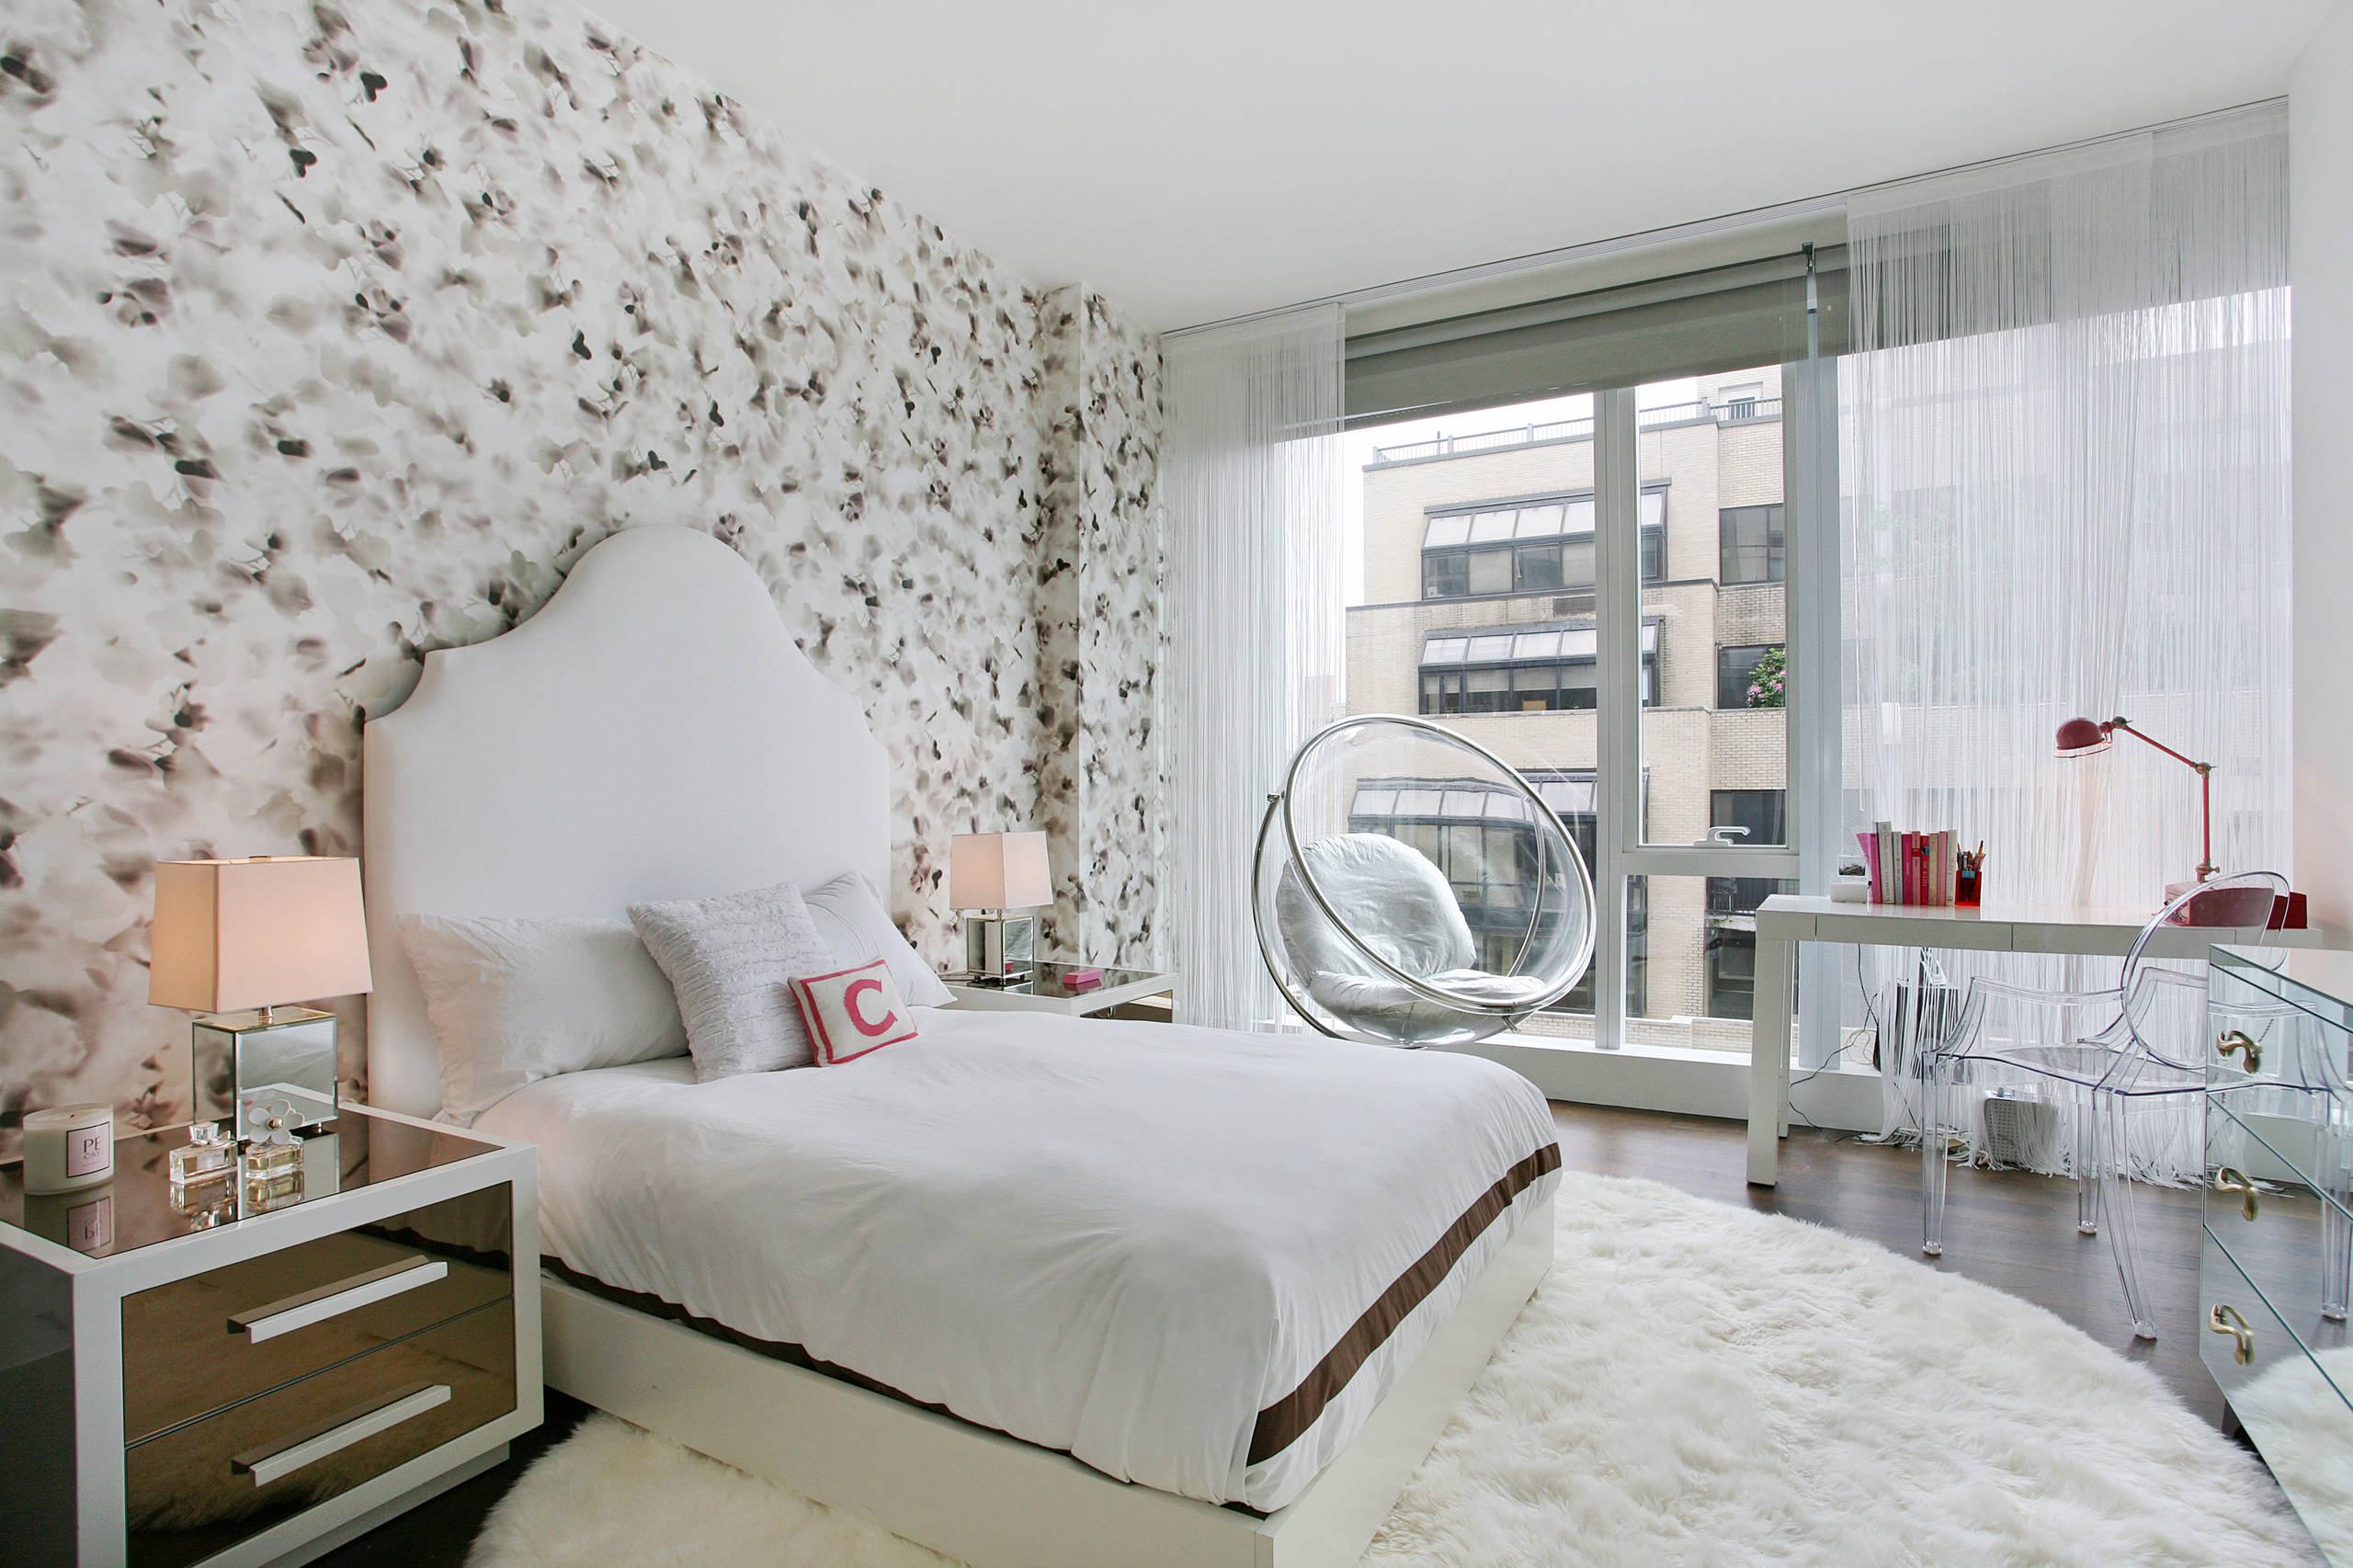 Bedroom Chair Ideas Houzz